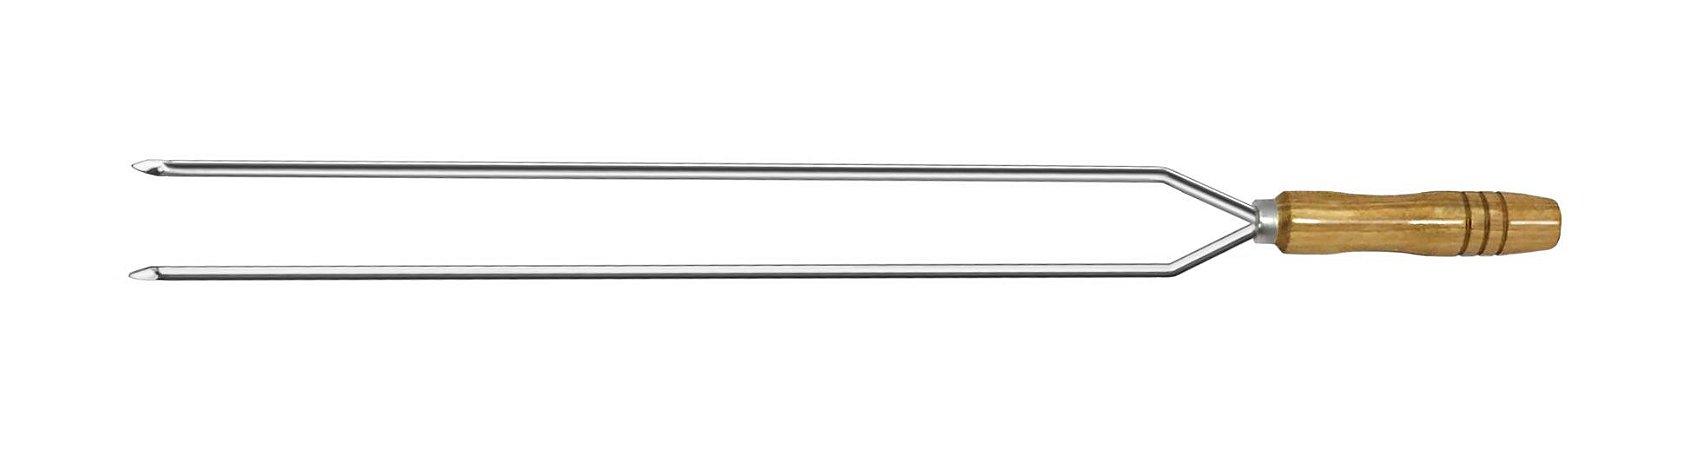 Espeto Inox Duplo 075cm x 1,5mm